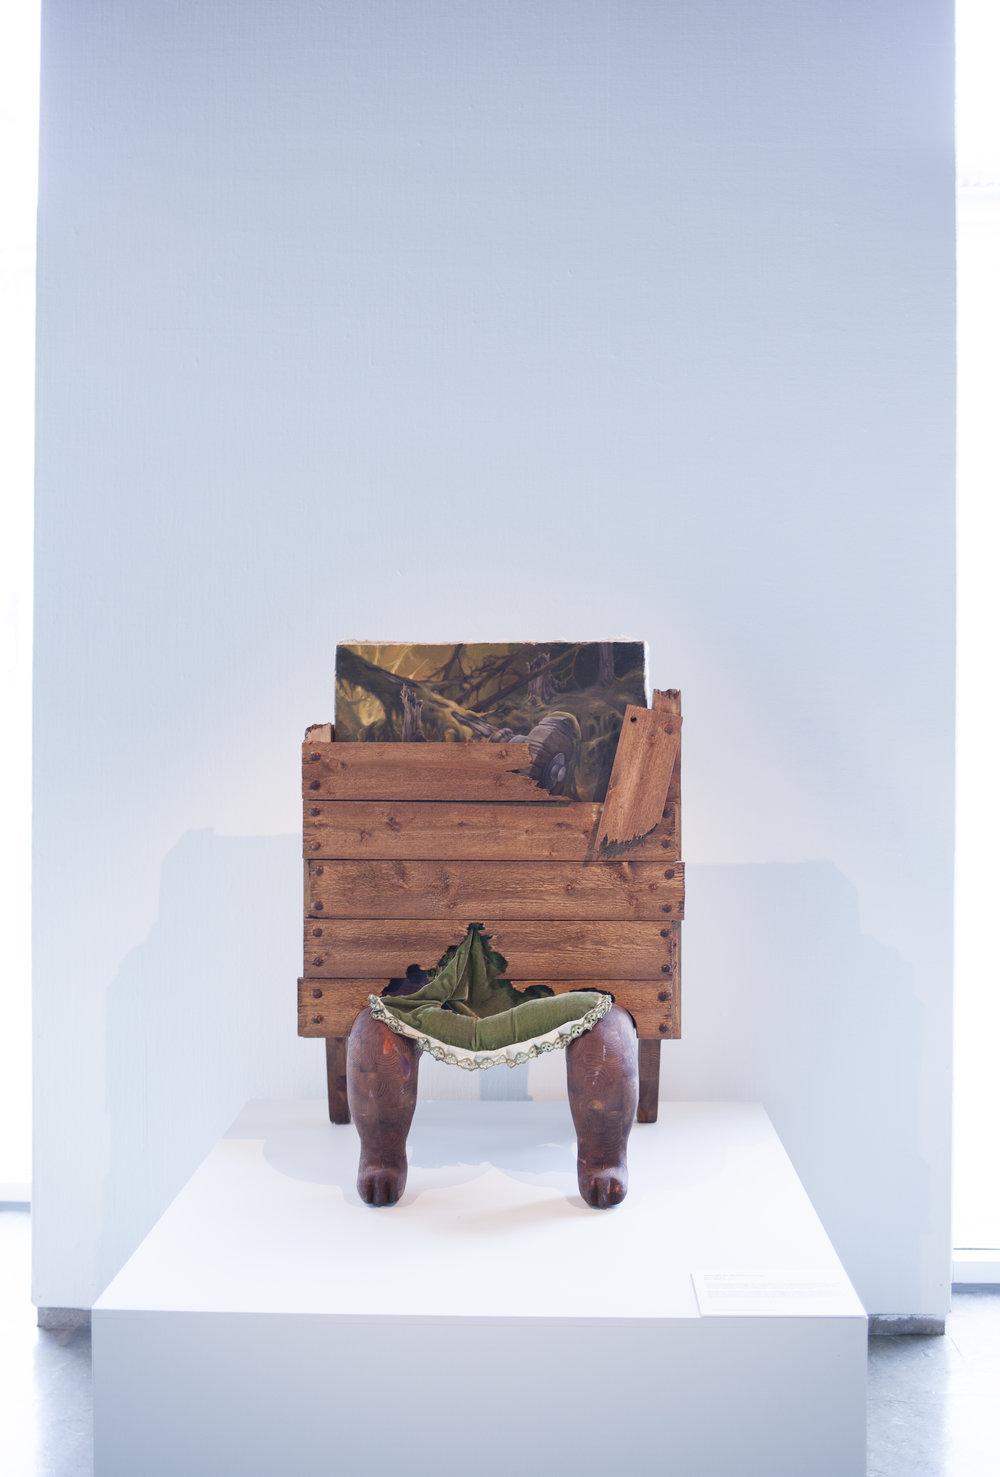 Bjørn Båsen,Woods in Wood. Foto: Nordenfjeldske Kunstindustrimuseum